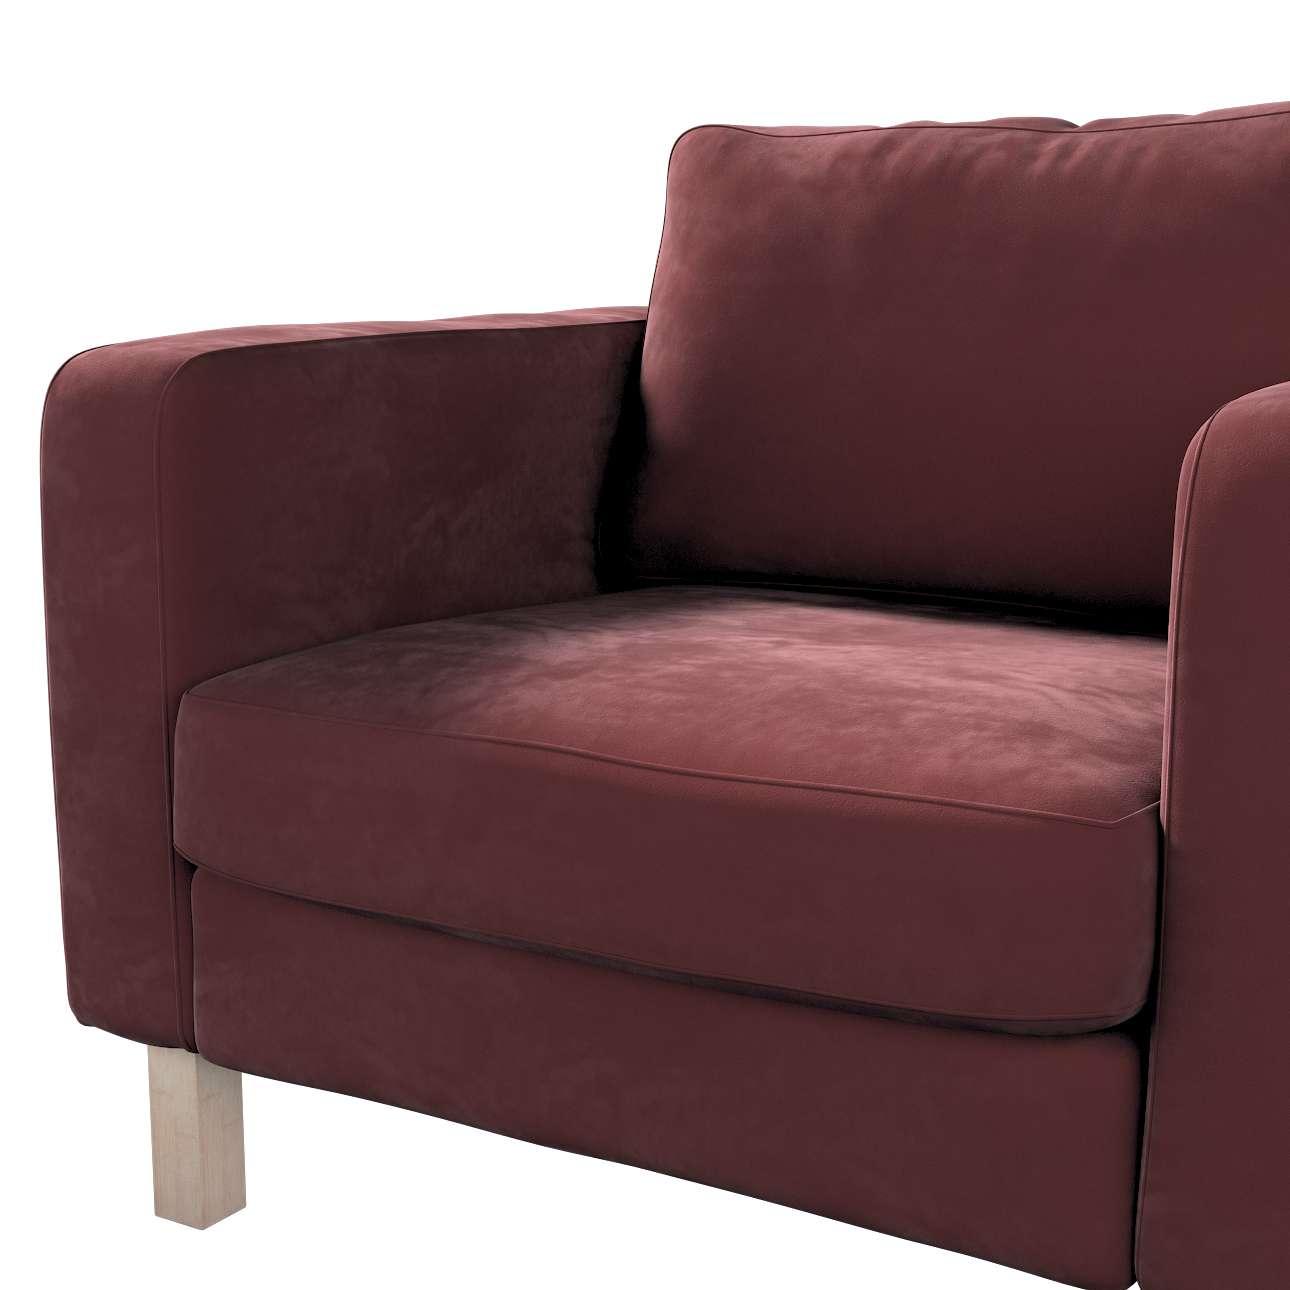 Pokrowiec na fotel Karlstad, krótki w kolekcji Velvet, tkanina: 704-26